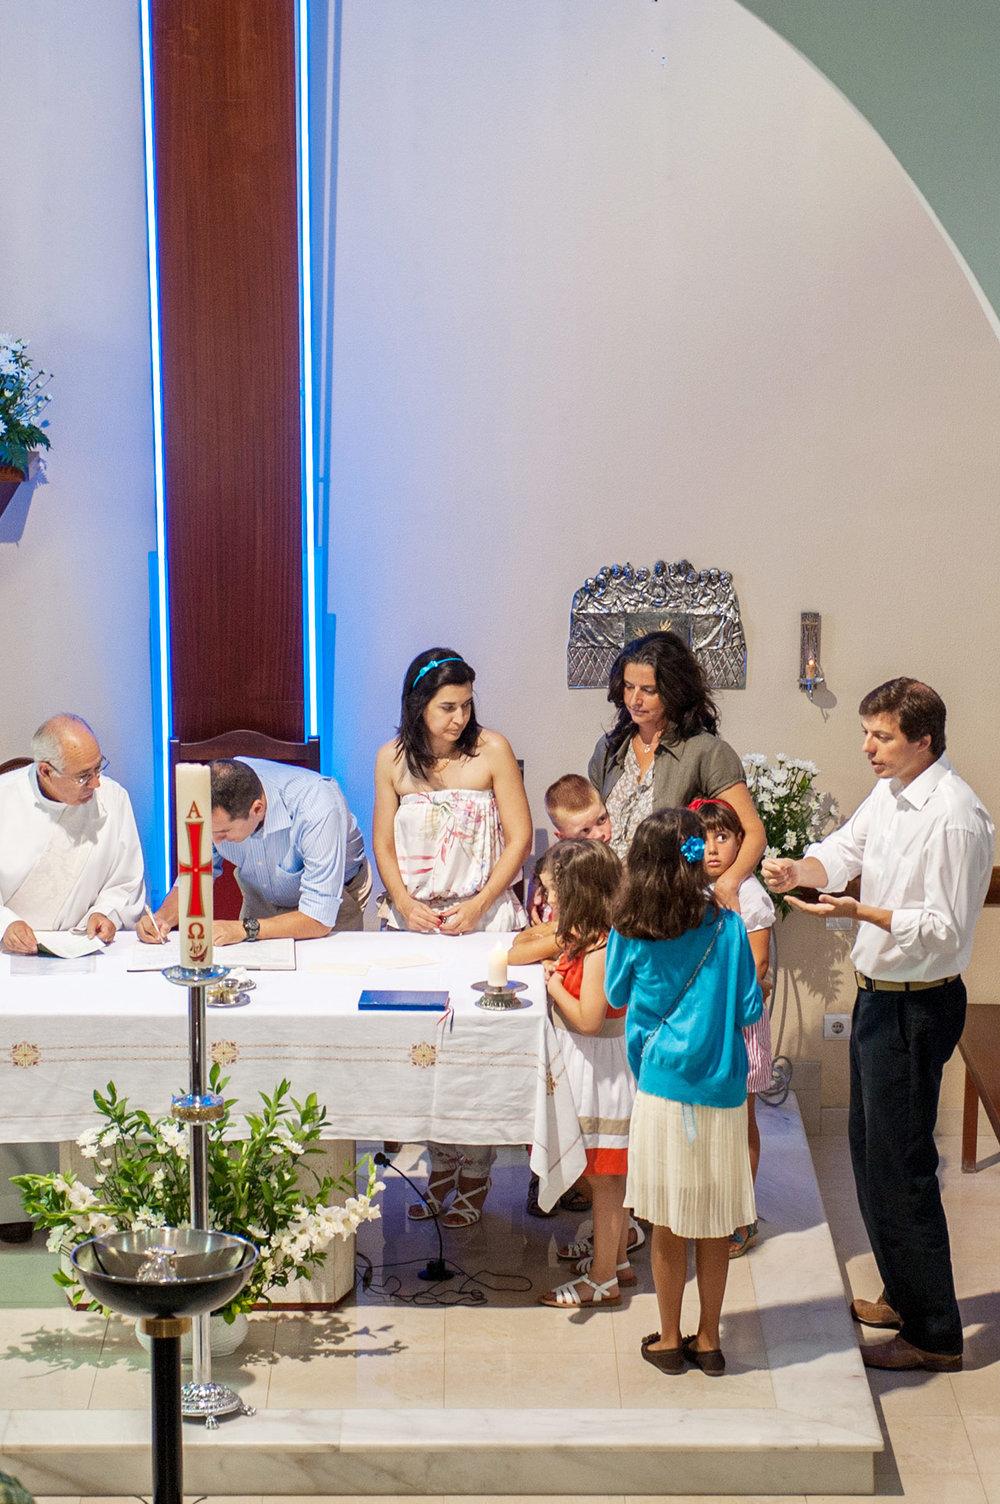 Ines-baptizado-14a.jpg